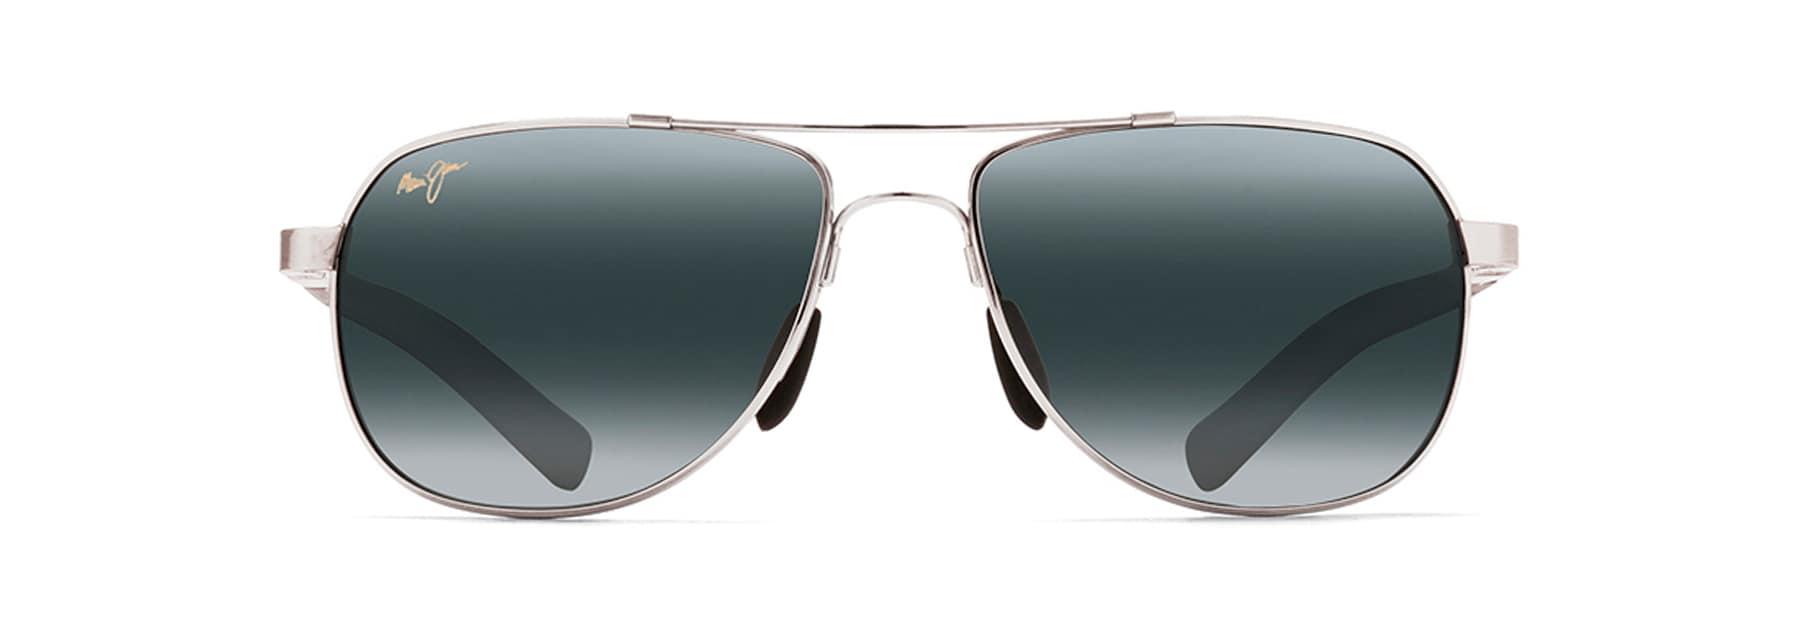 7f35ca7163b GUARDRAILS. Polarized Aviator Sunglasses